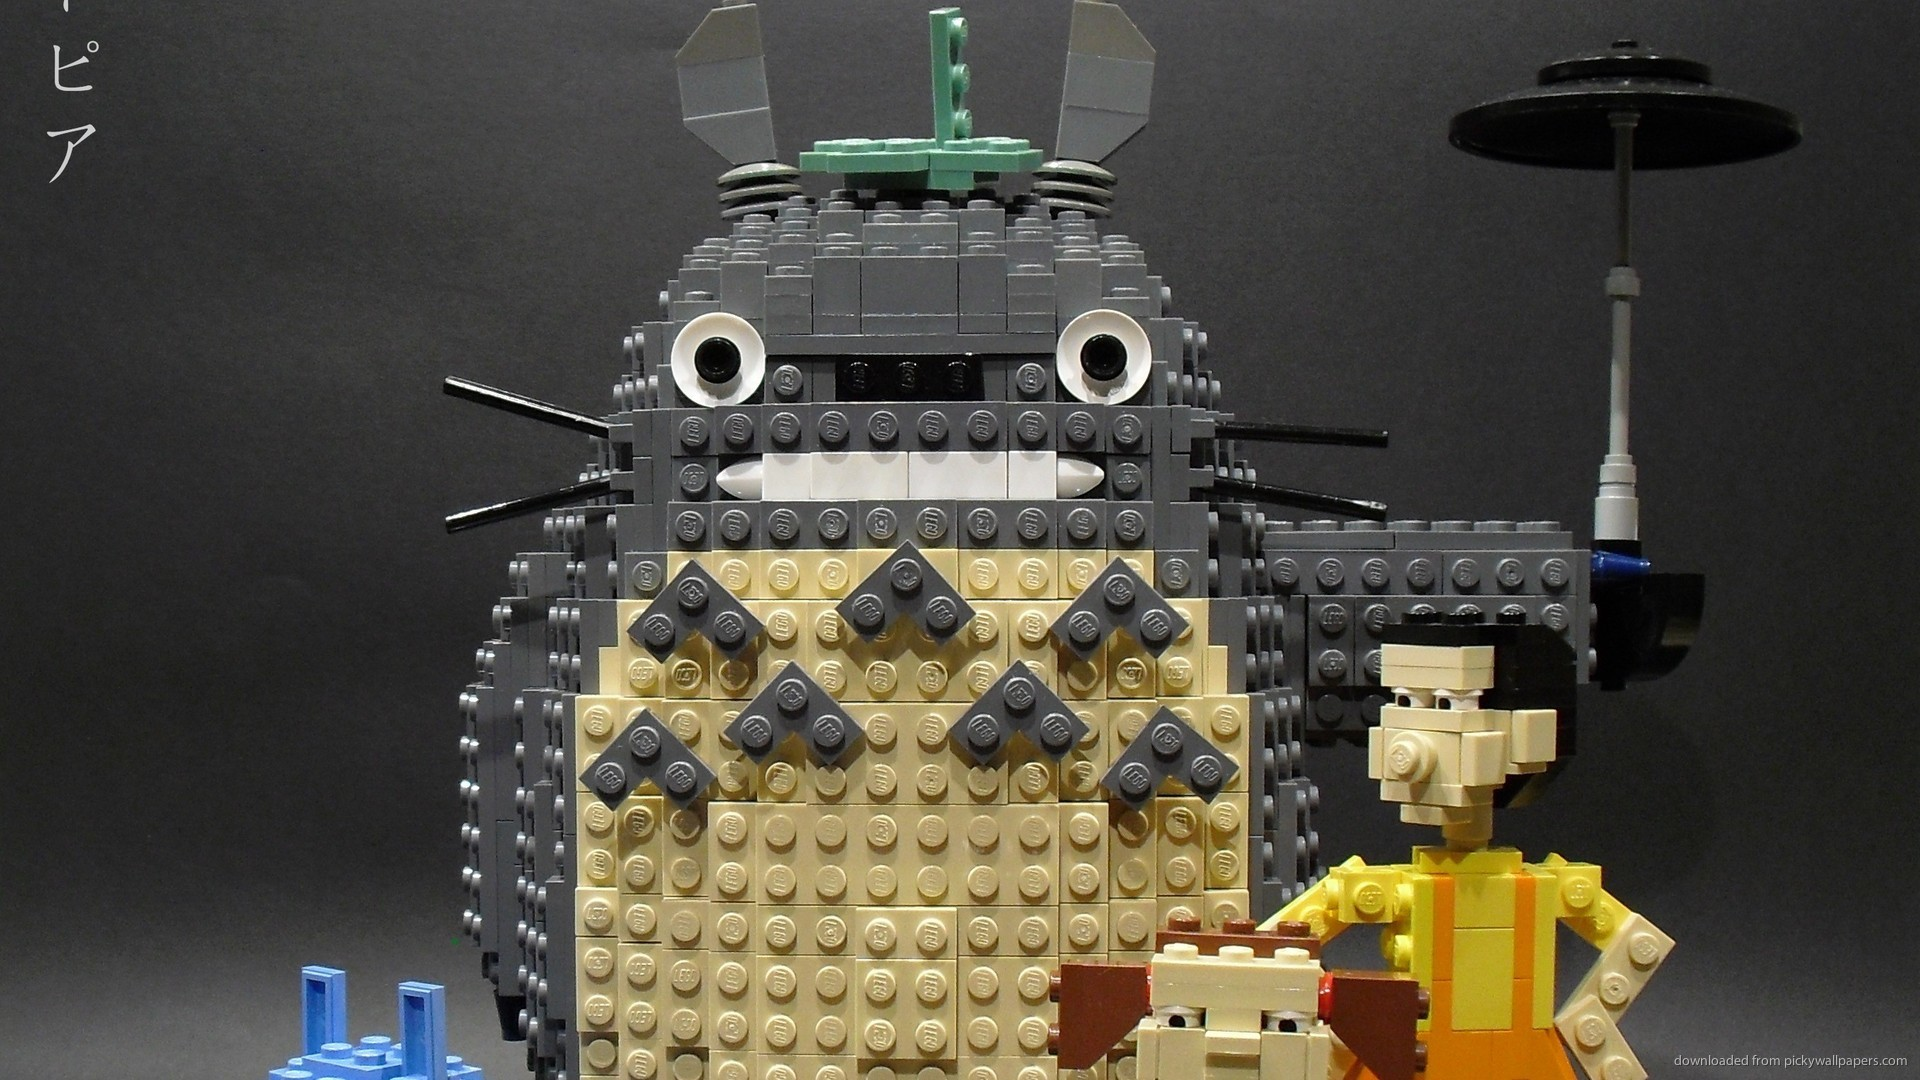 HD My Neighbor Totoro LEGO wallpaper